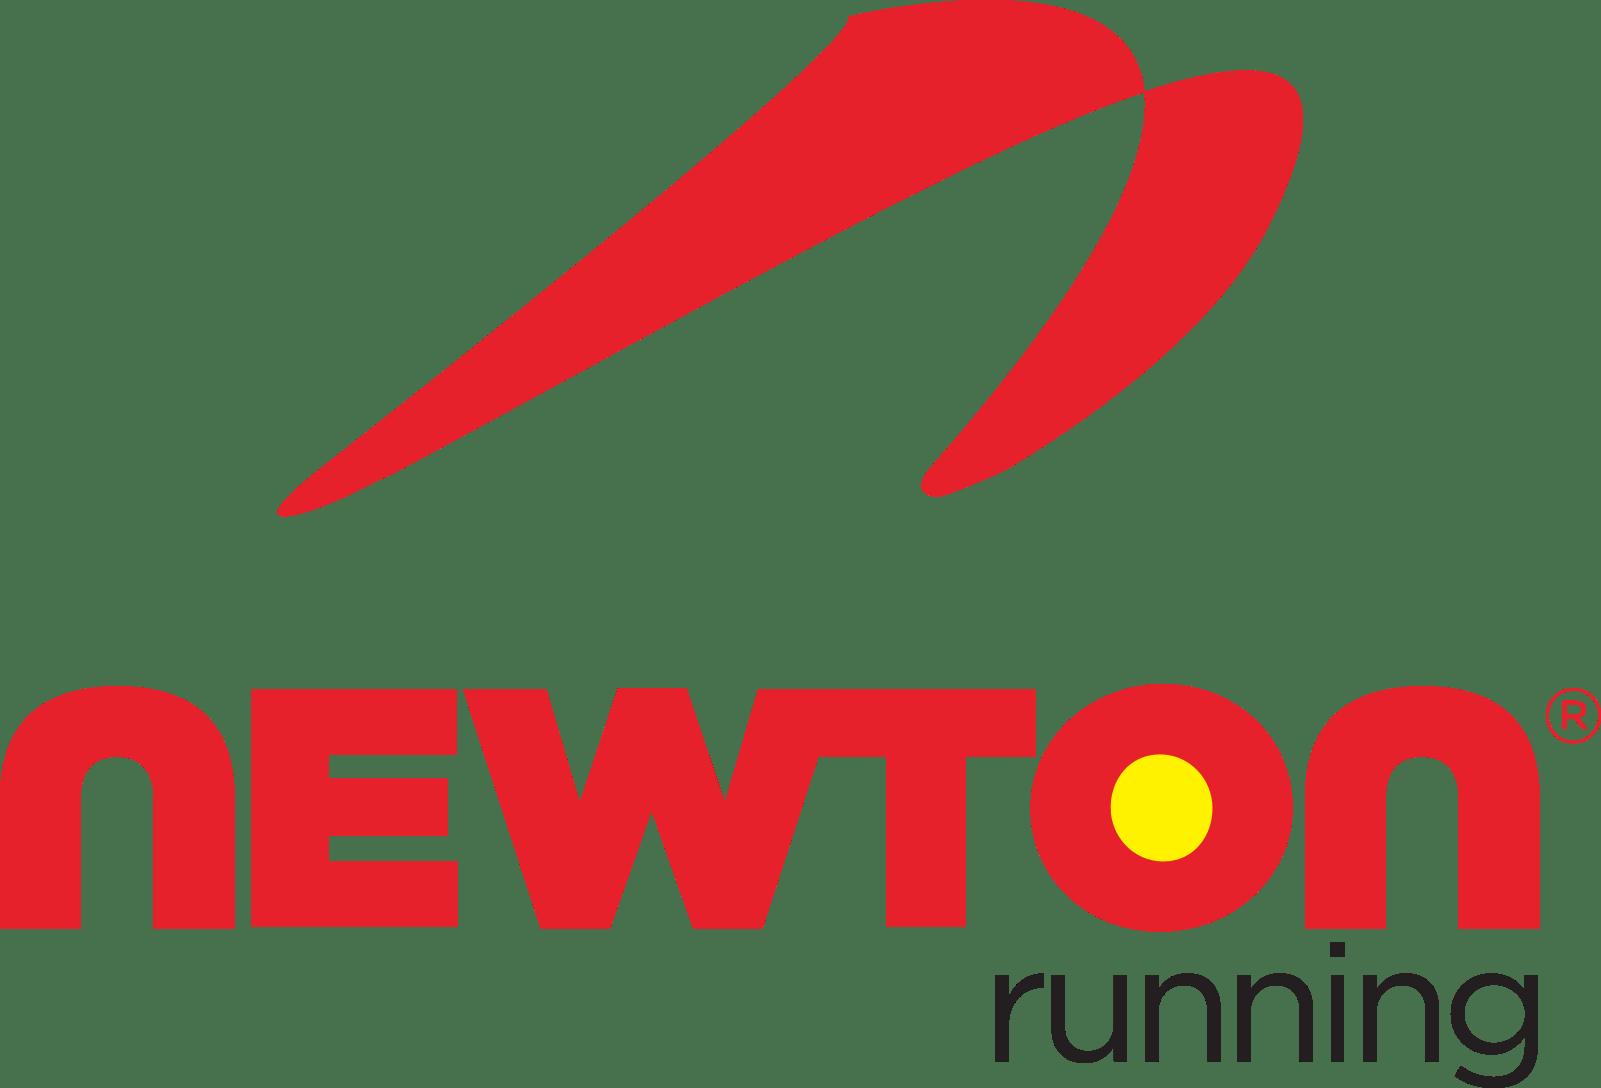 newton running logo nicolas raybaud